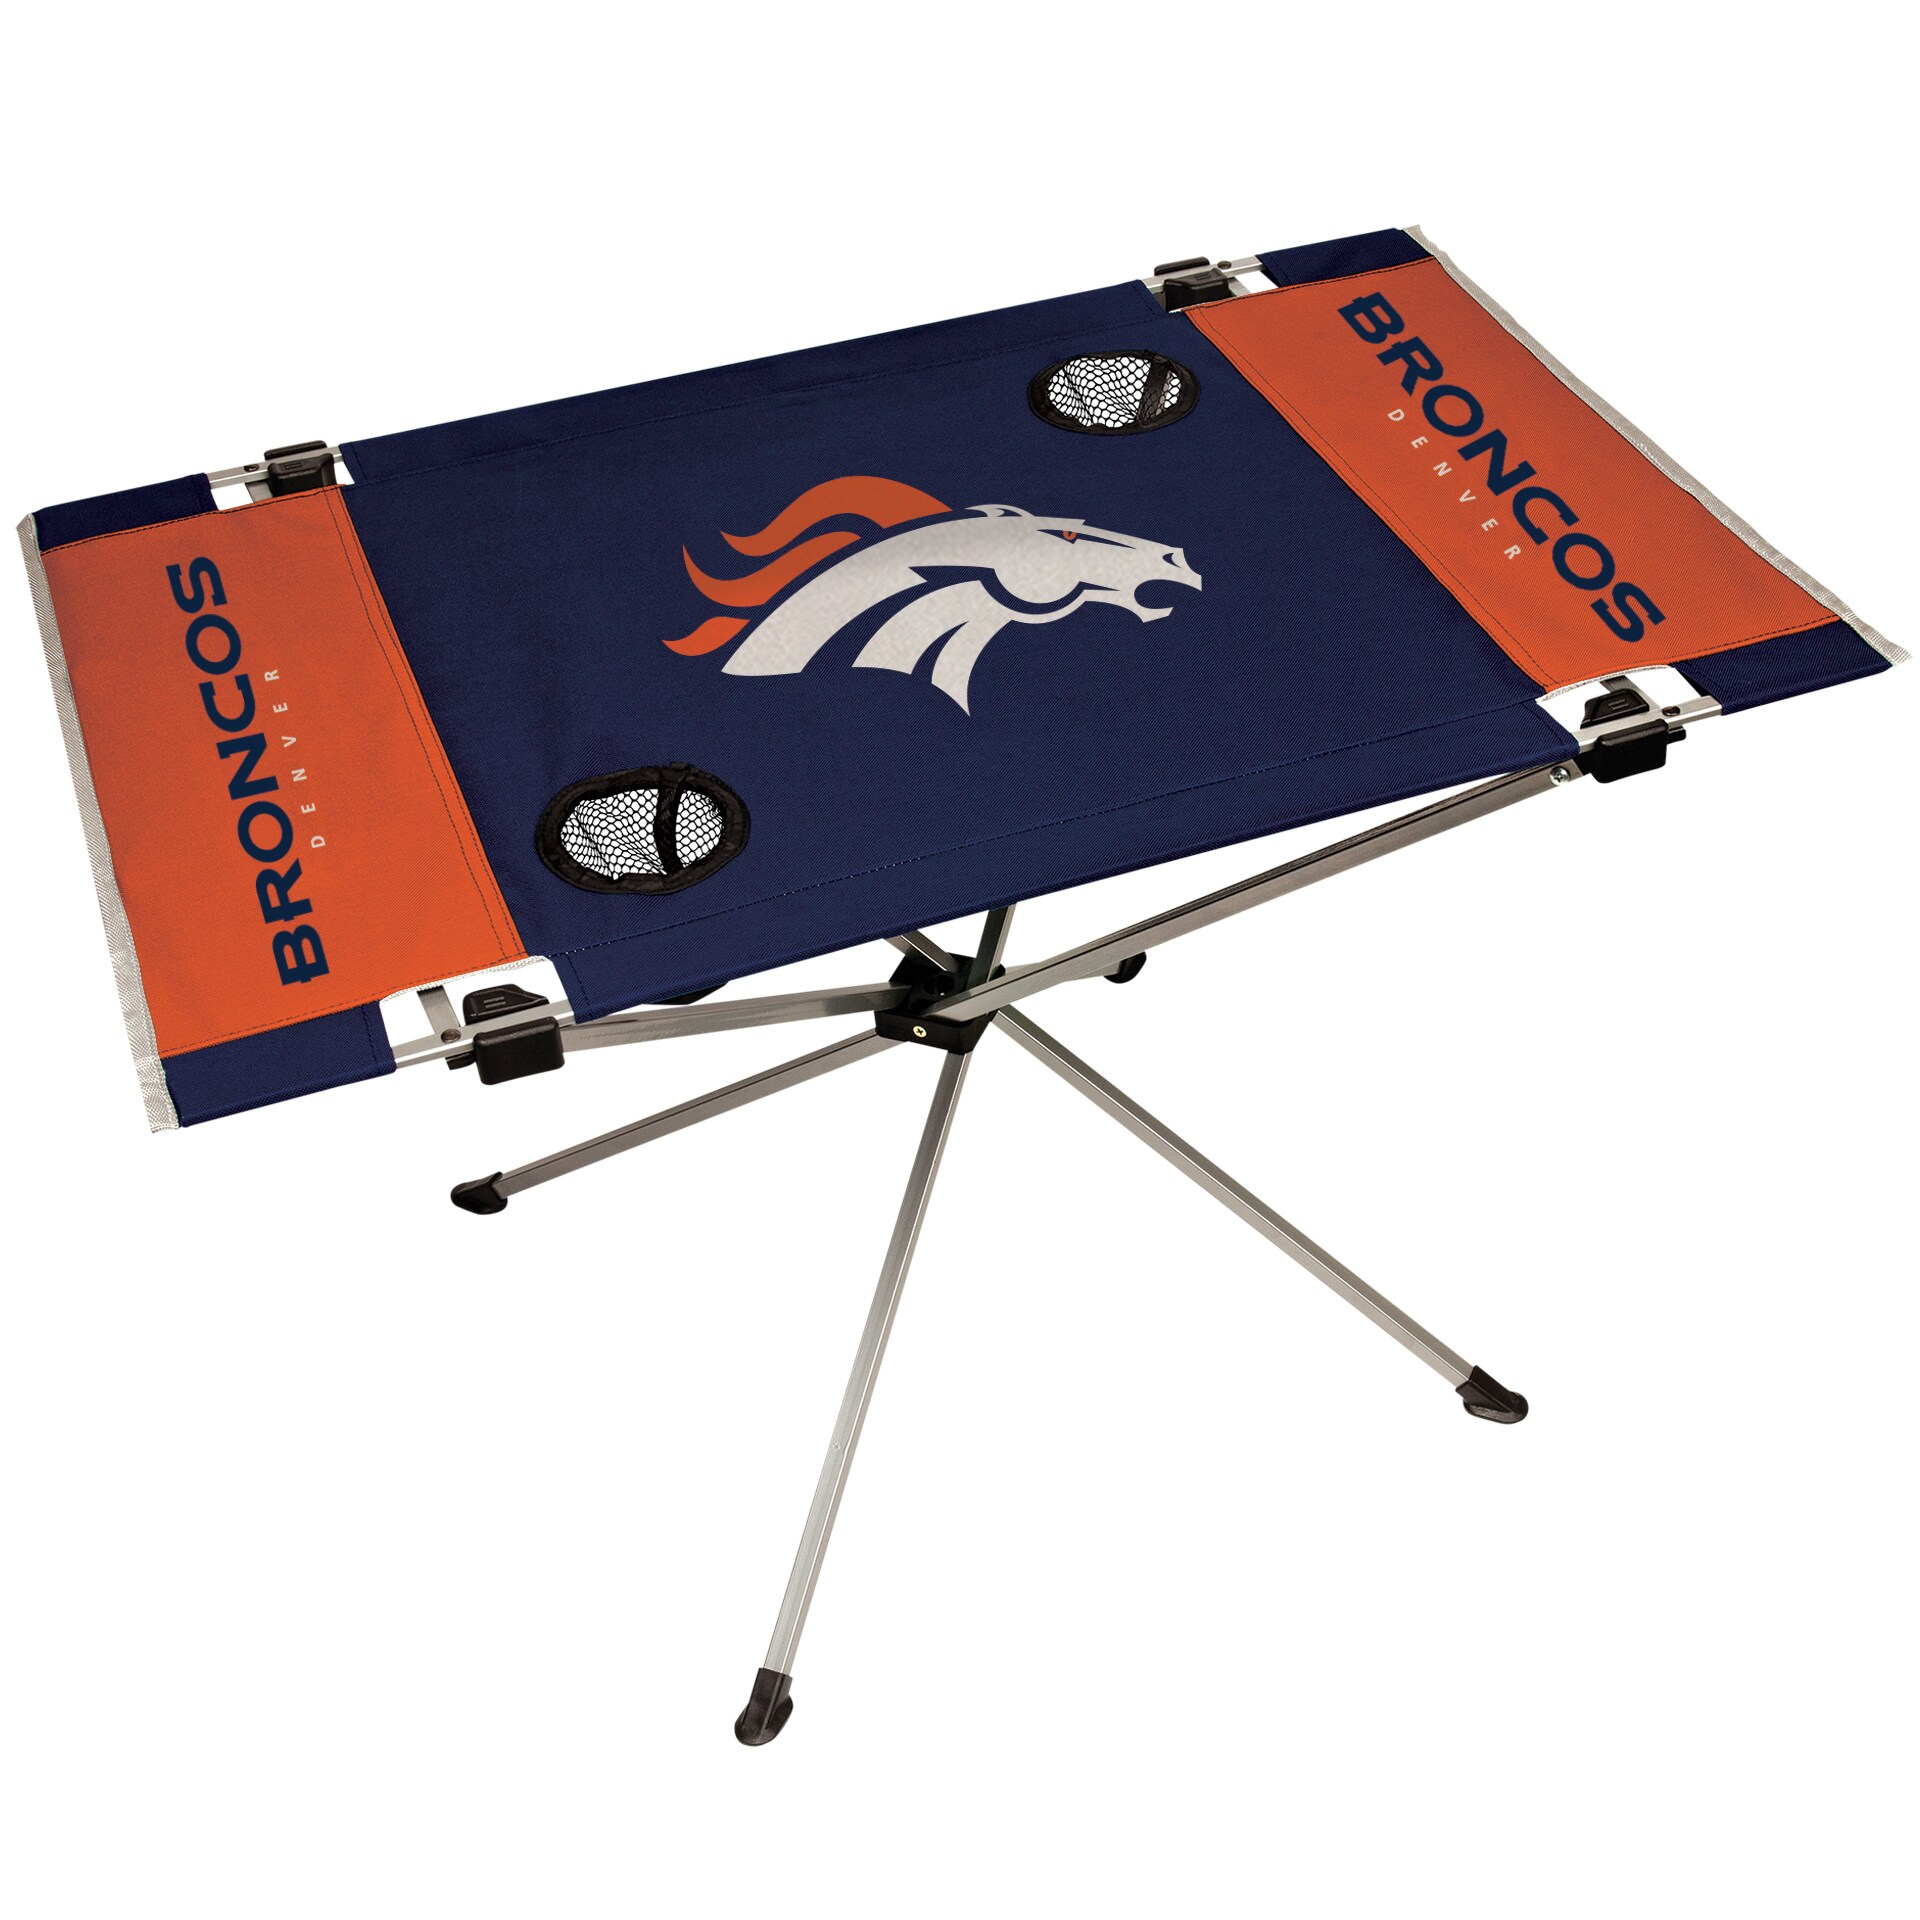 Denver Broncos End Zone Table